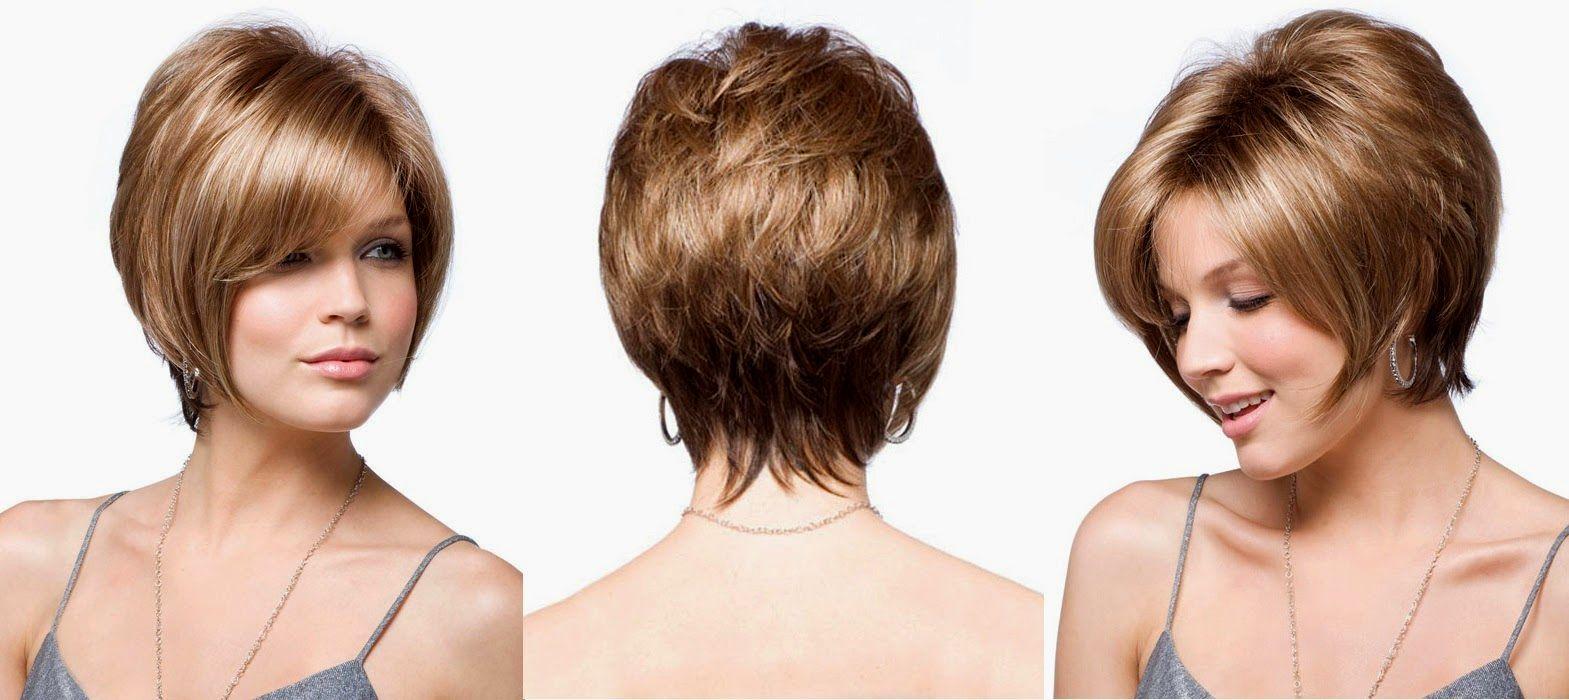 beautiful modelo corte cabelo curto imagem-Ótimo Modelo Corte Cabelo Curto Galeria